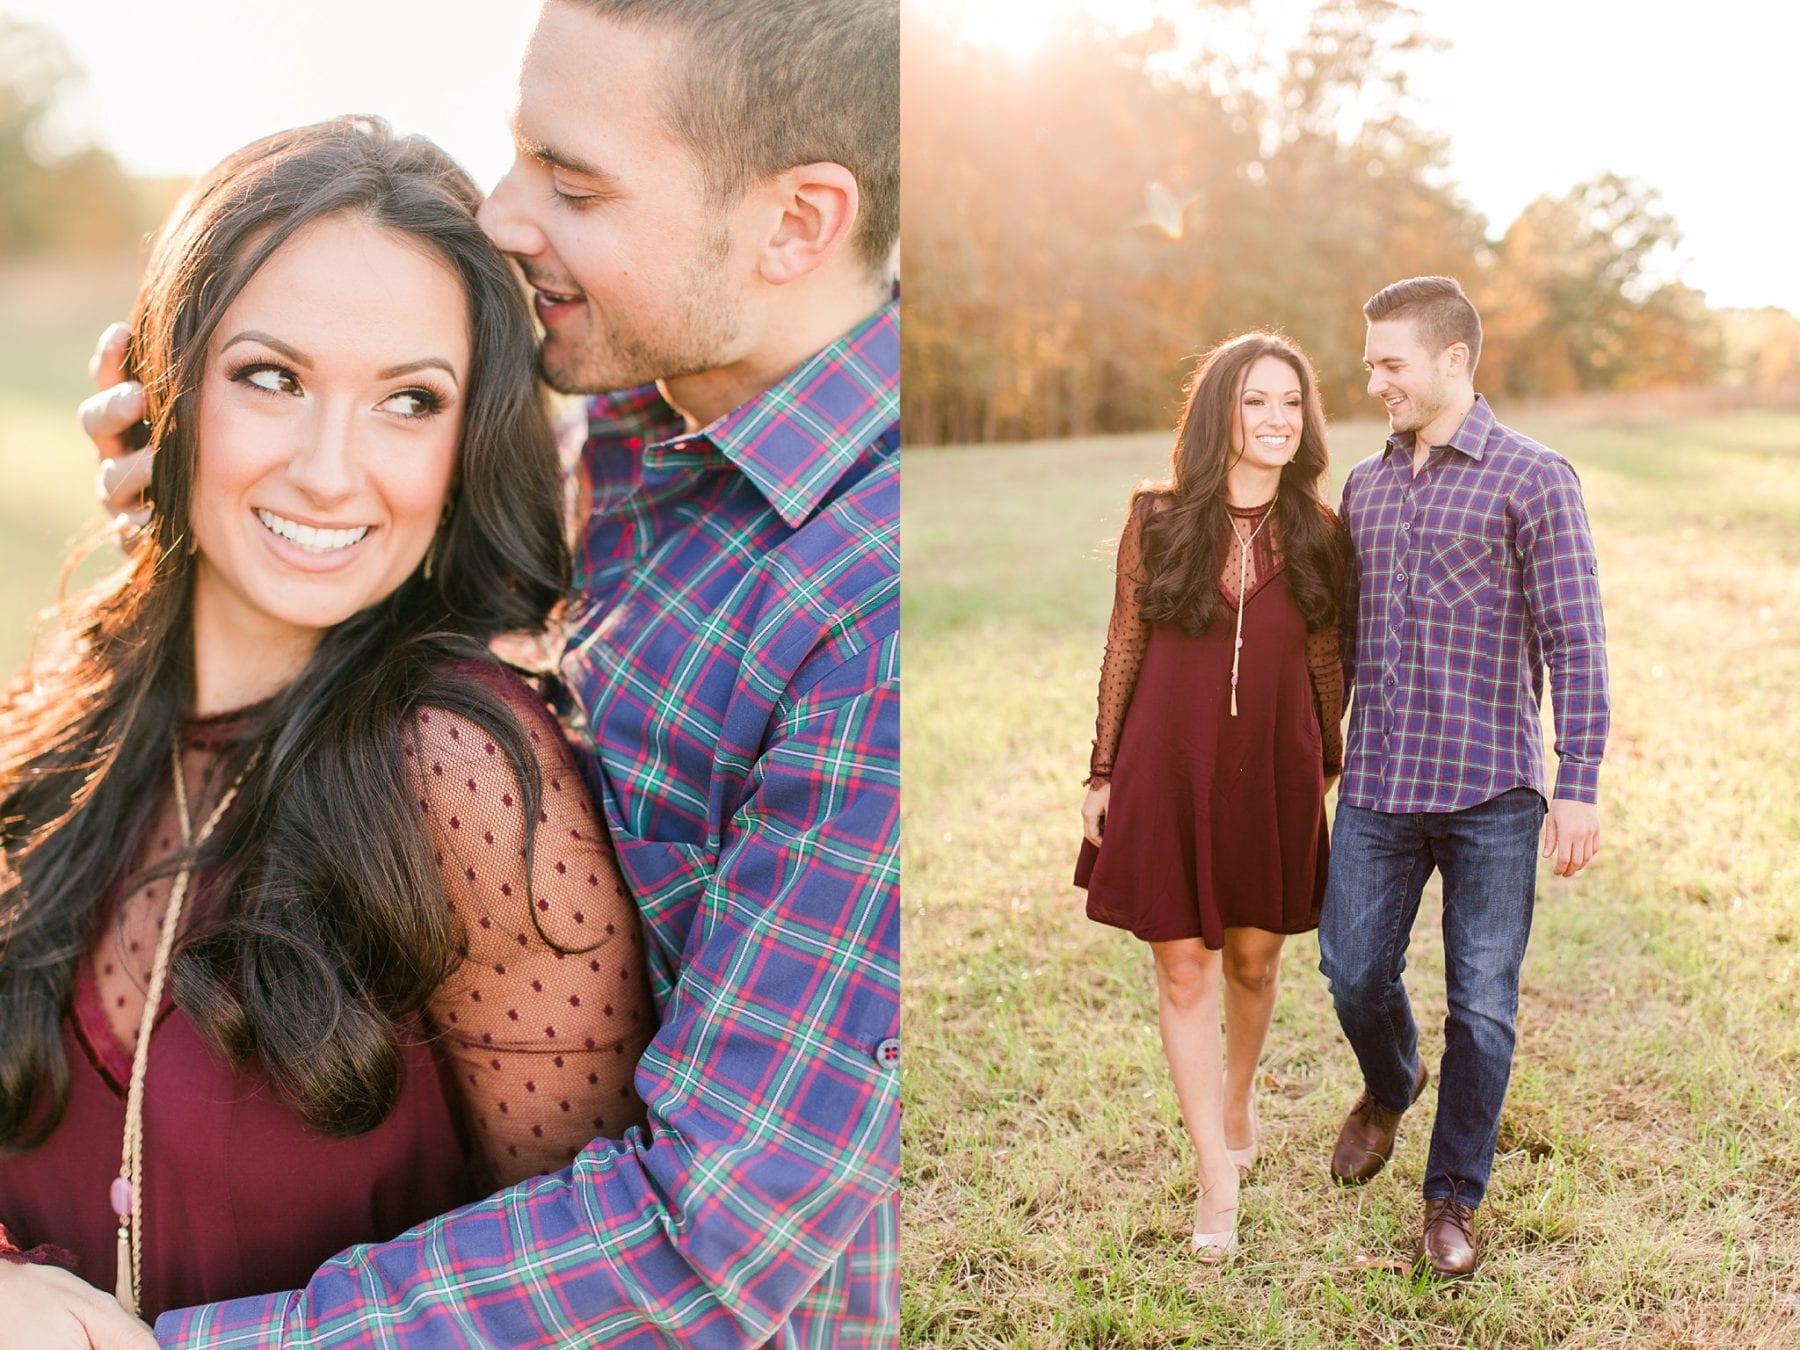 Manassas Battlefield Portraits Virginia Wedding Photographer Megan Kelsey Photography Lianne & Chris-78.jpg